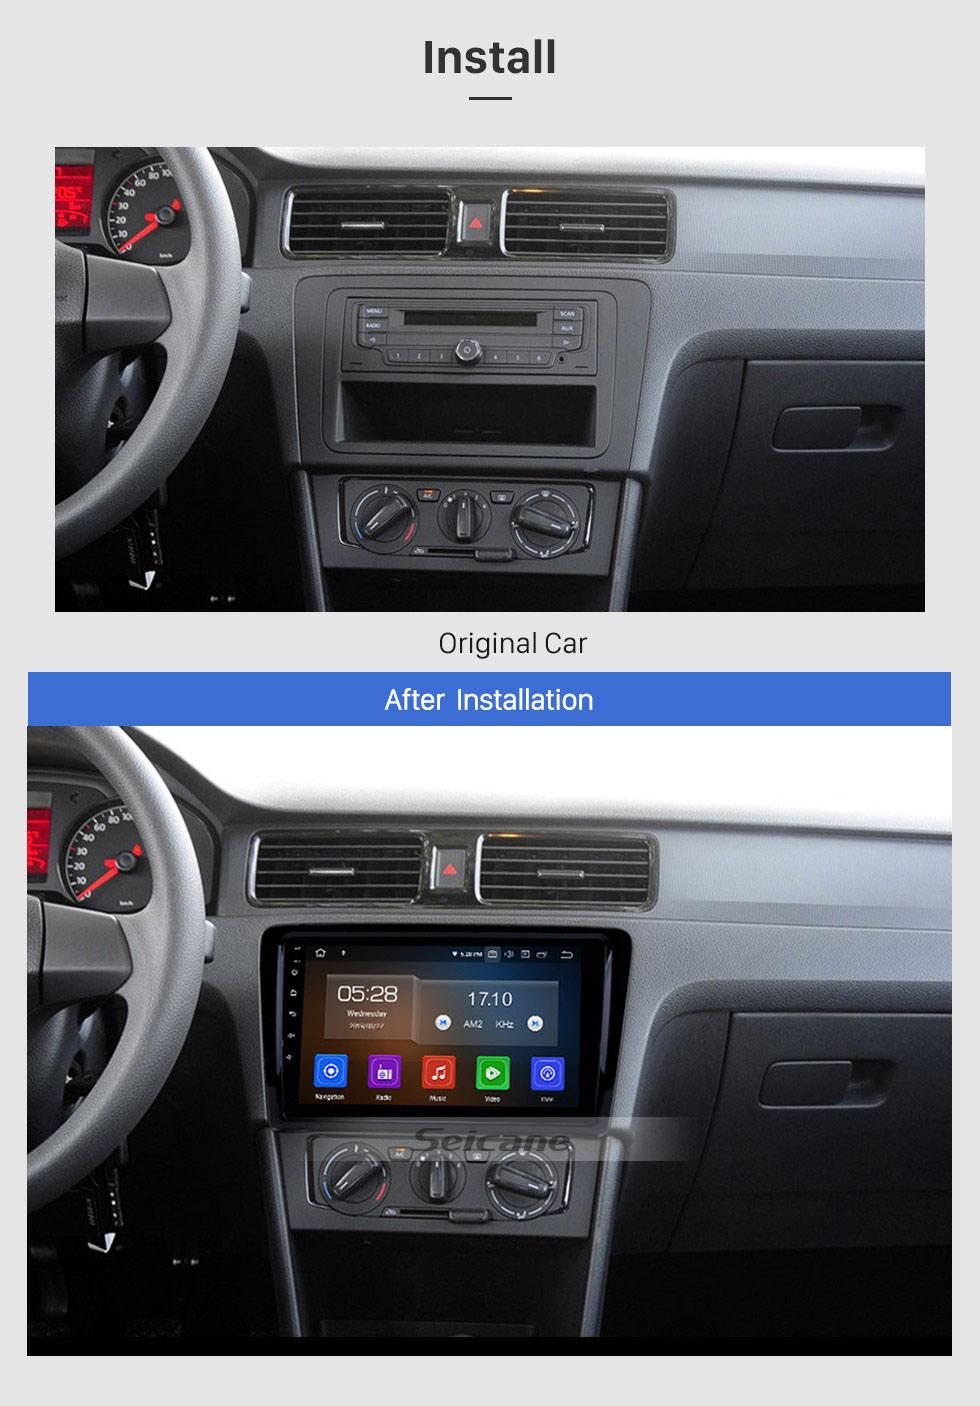 Seicane 9 inch 2012-2015 VW Volkswagen Santana Android 9.0 Radio GPS Navigation System Support 3G/4G WiFi Rear View Camera Backup Camera Mirror Link Bluetooth DVR